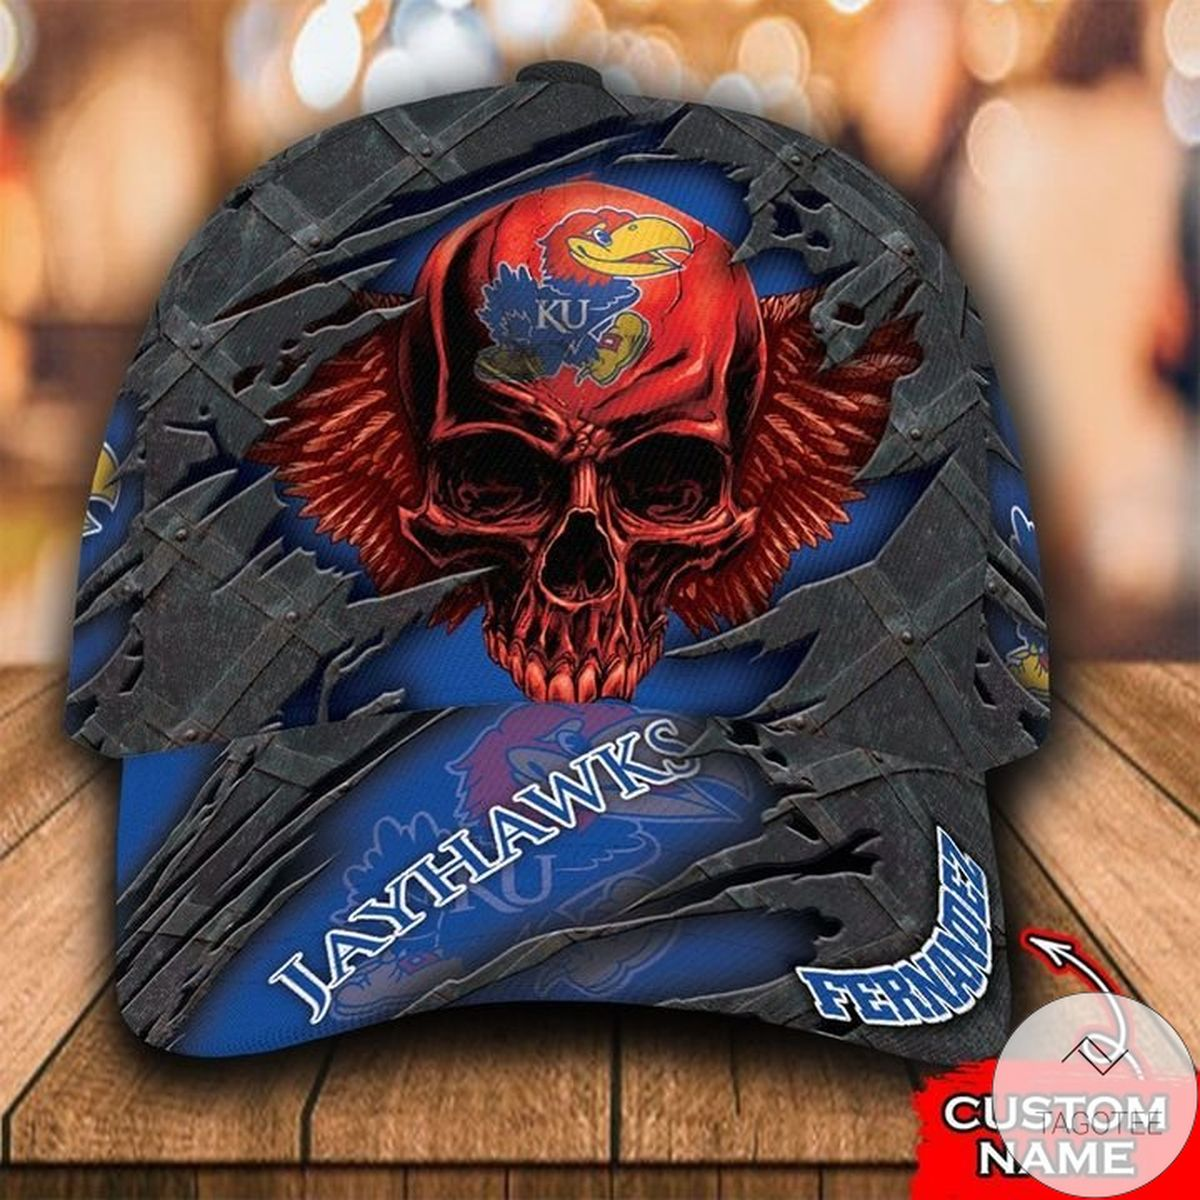 Personalized NCAA Kansas Jayhawks 3D Skull Cap